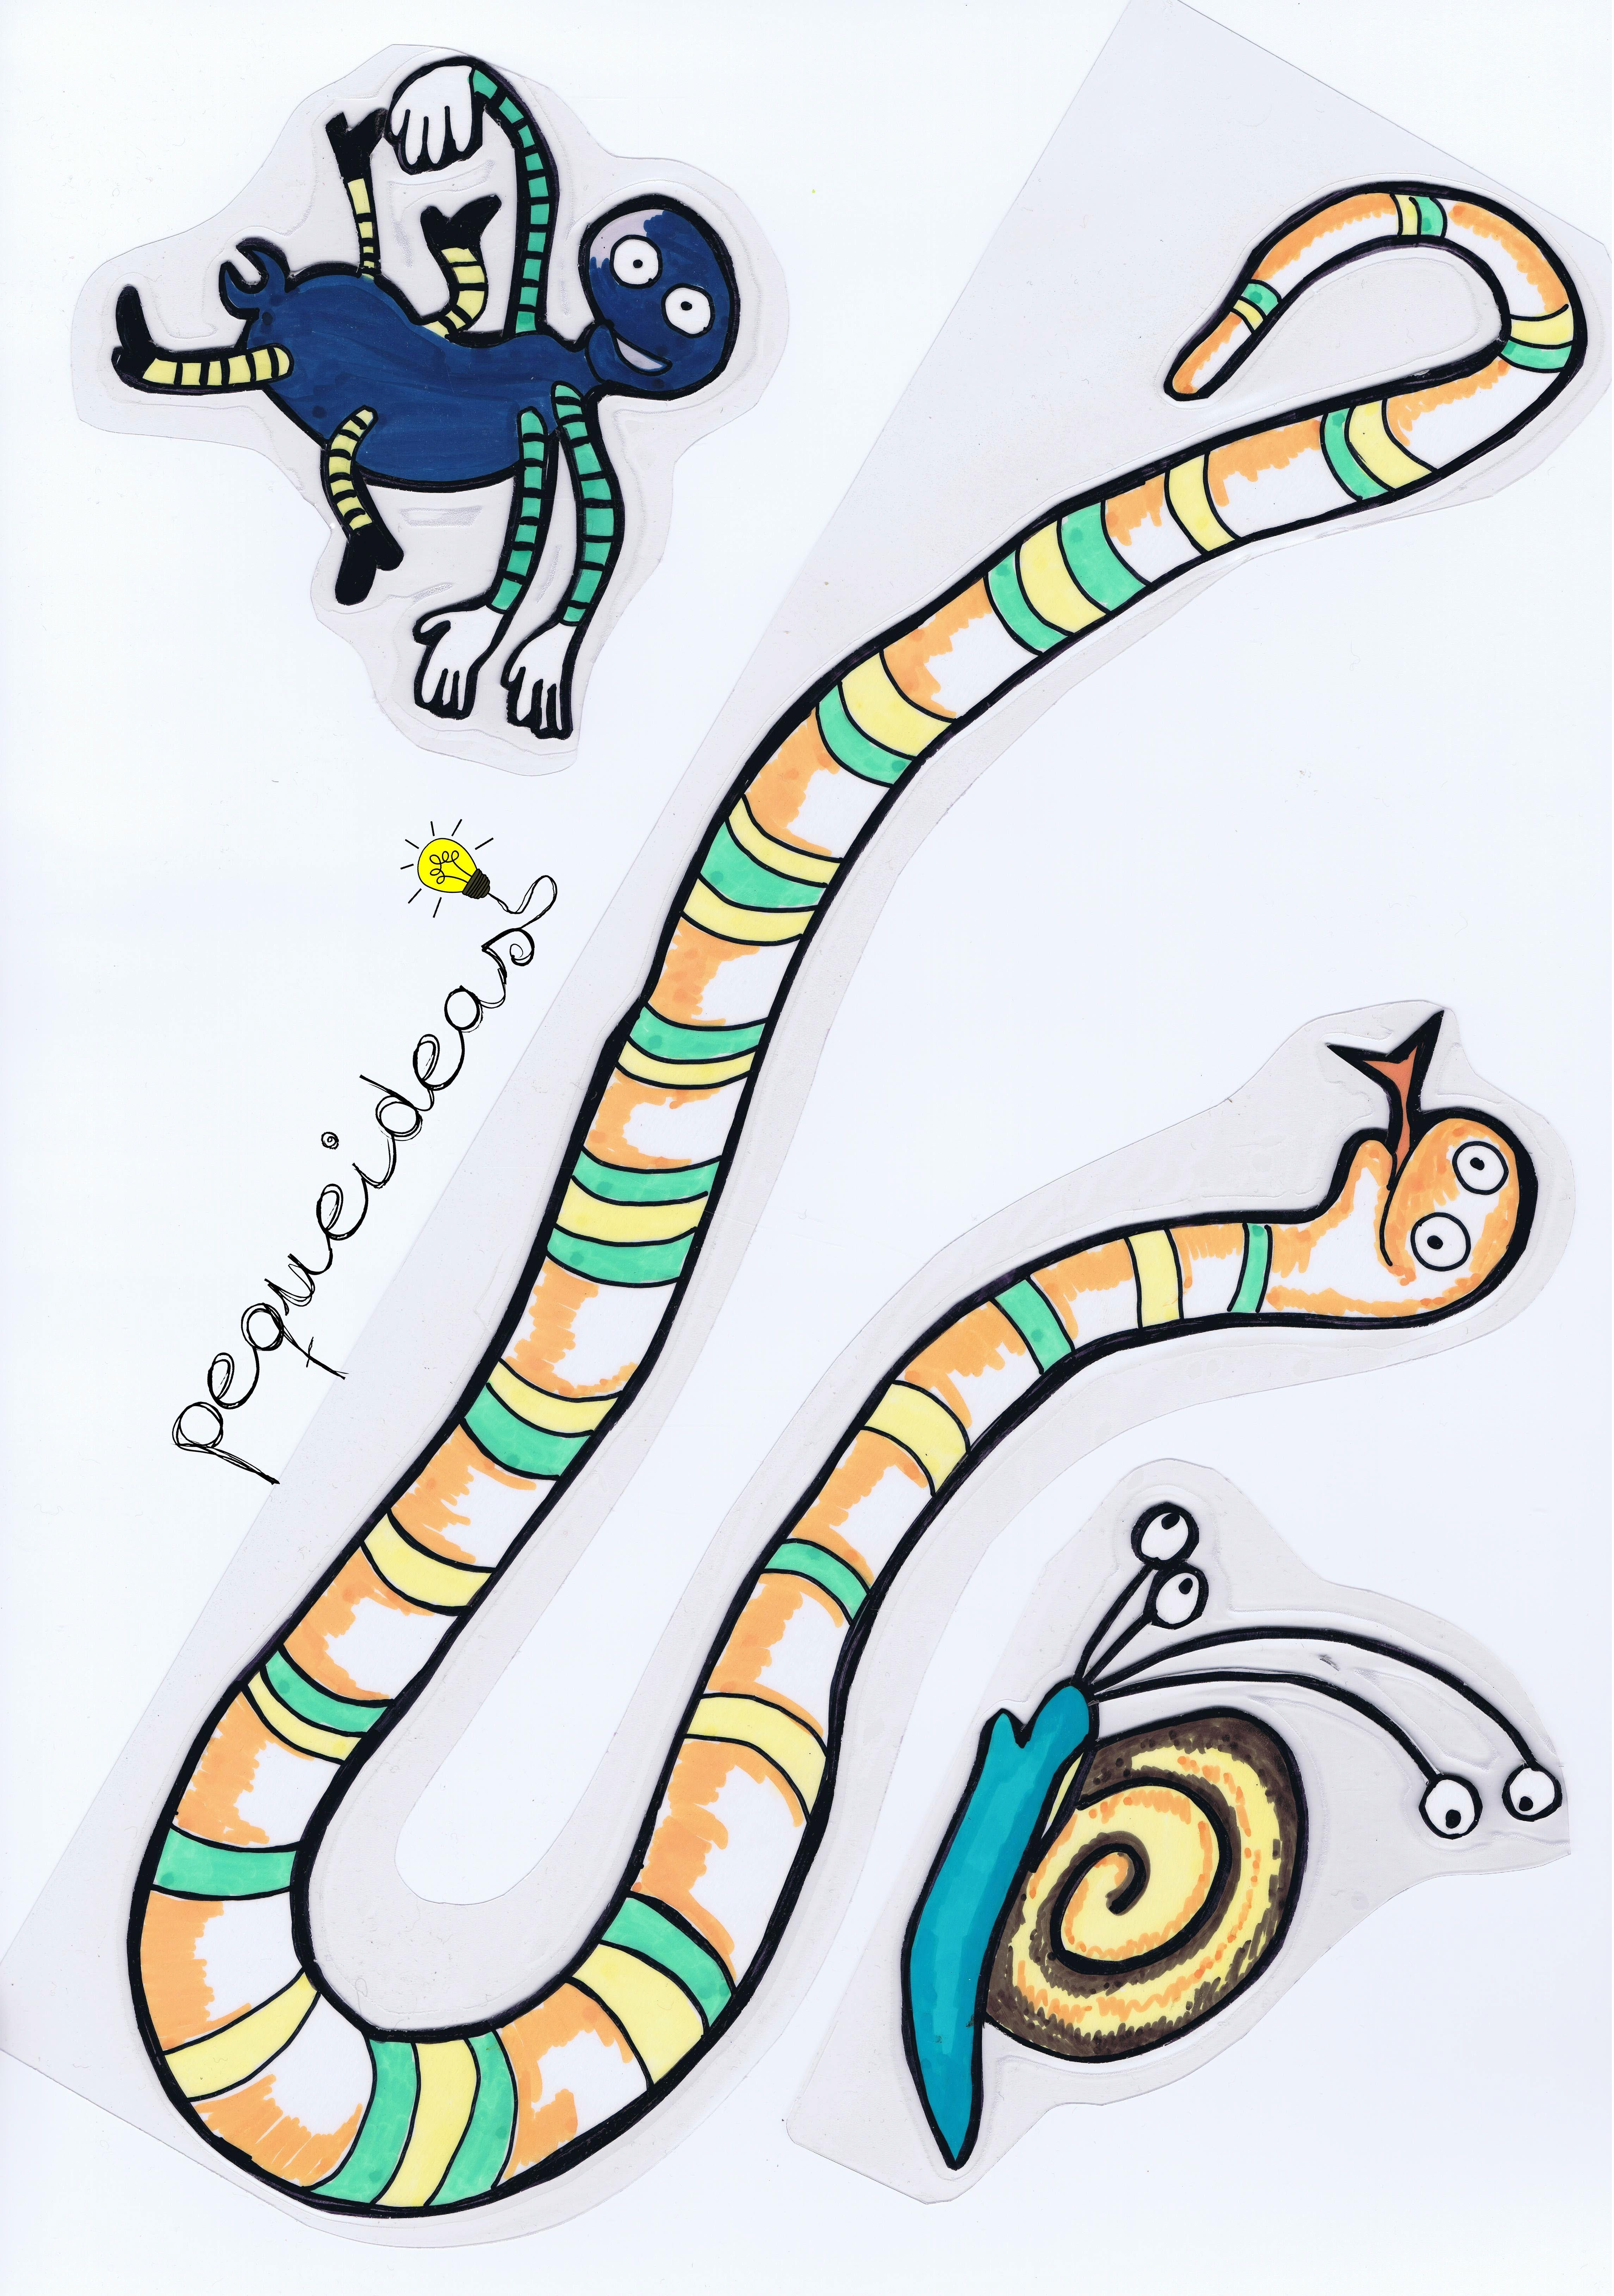 La cebra Camila 1 | La cebra camila, Botellas de